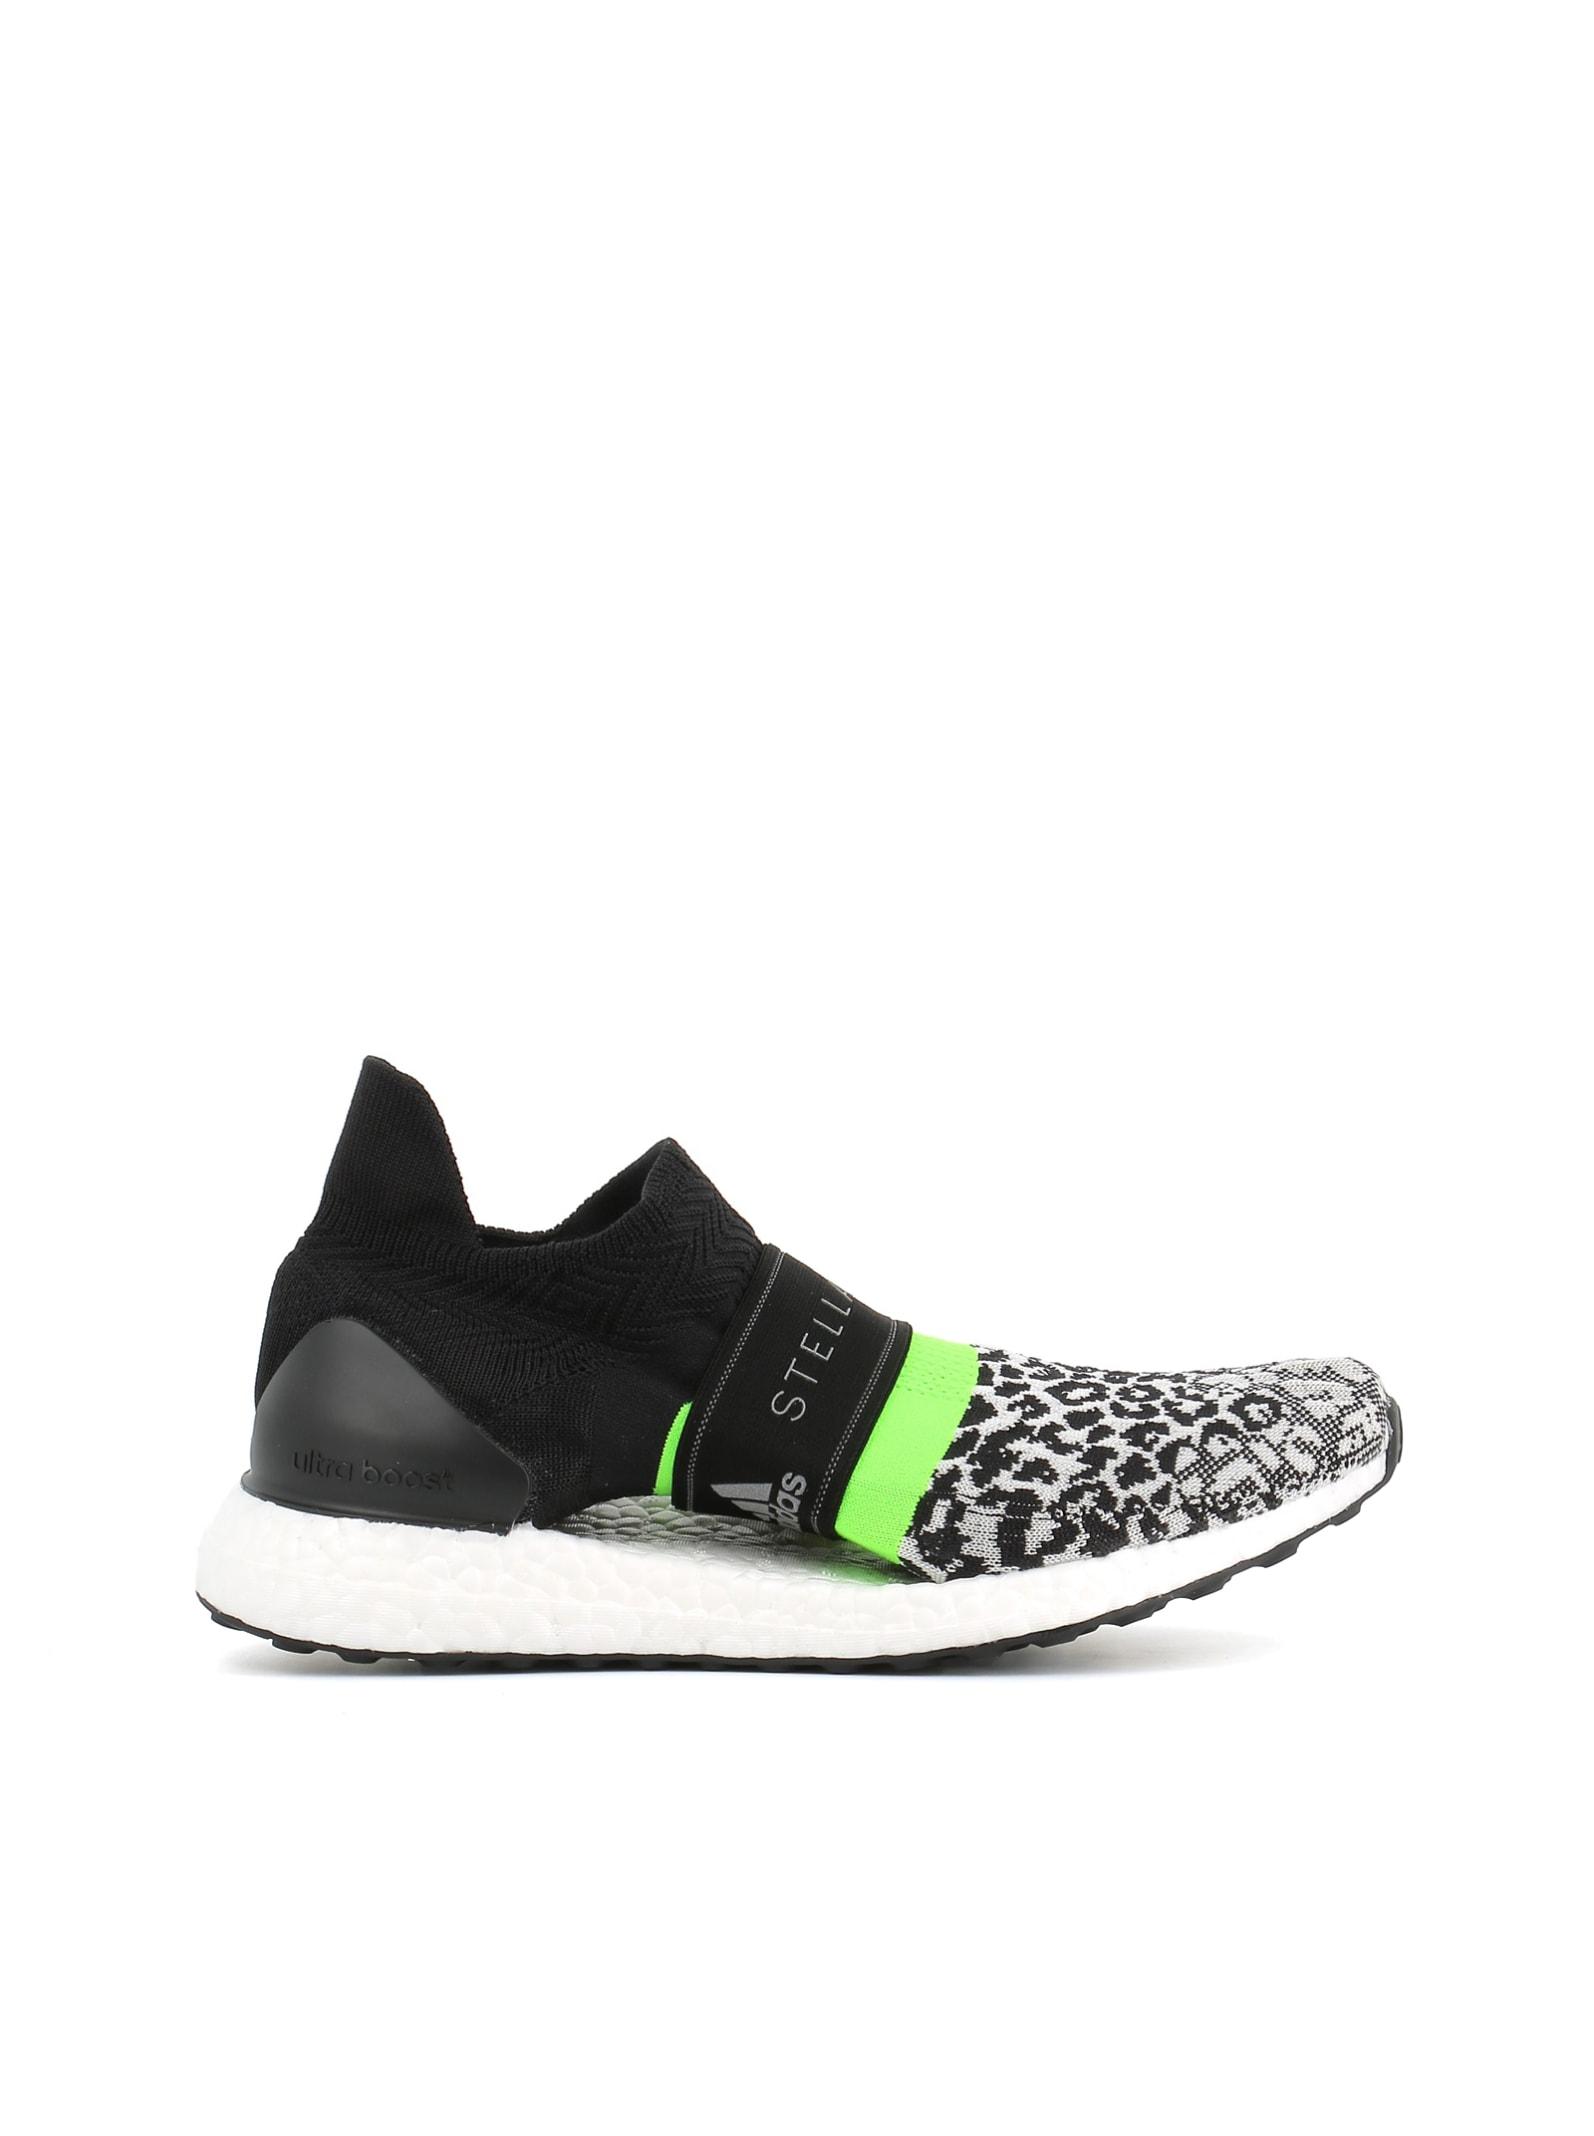 new style 70e61 79c92 Adidas By Stella Mccartney Sneaker